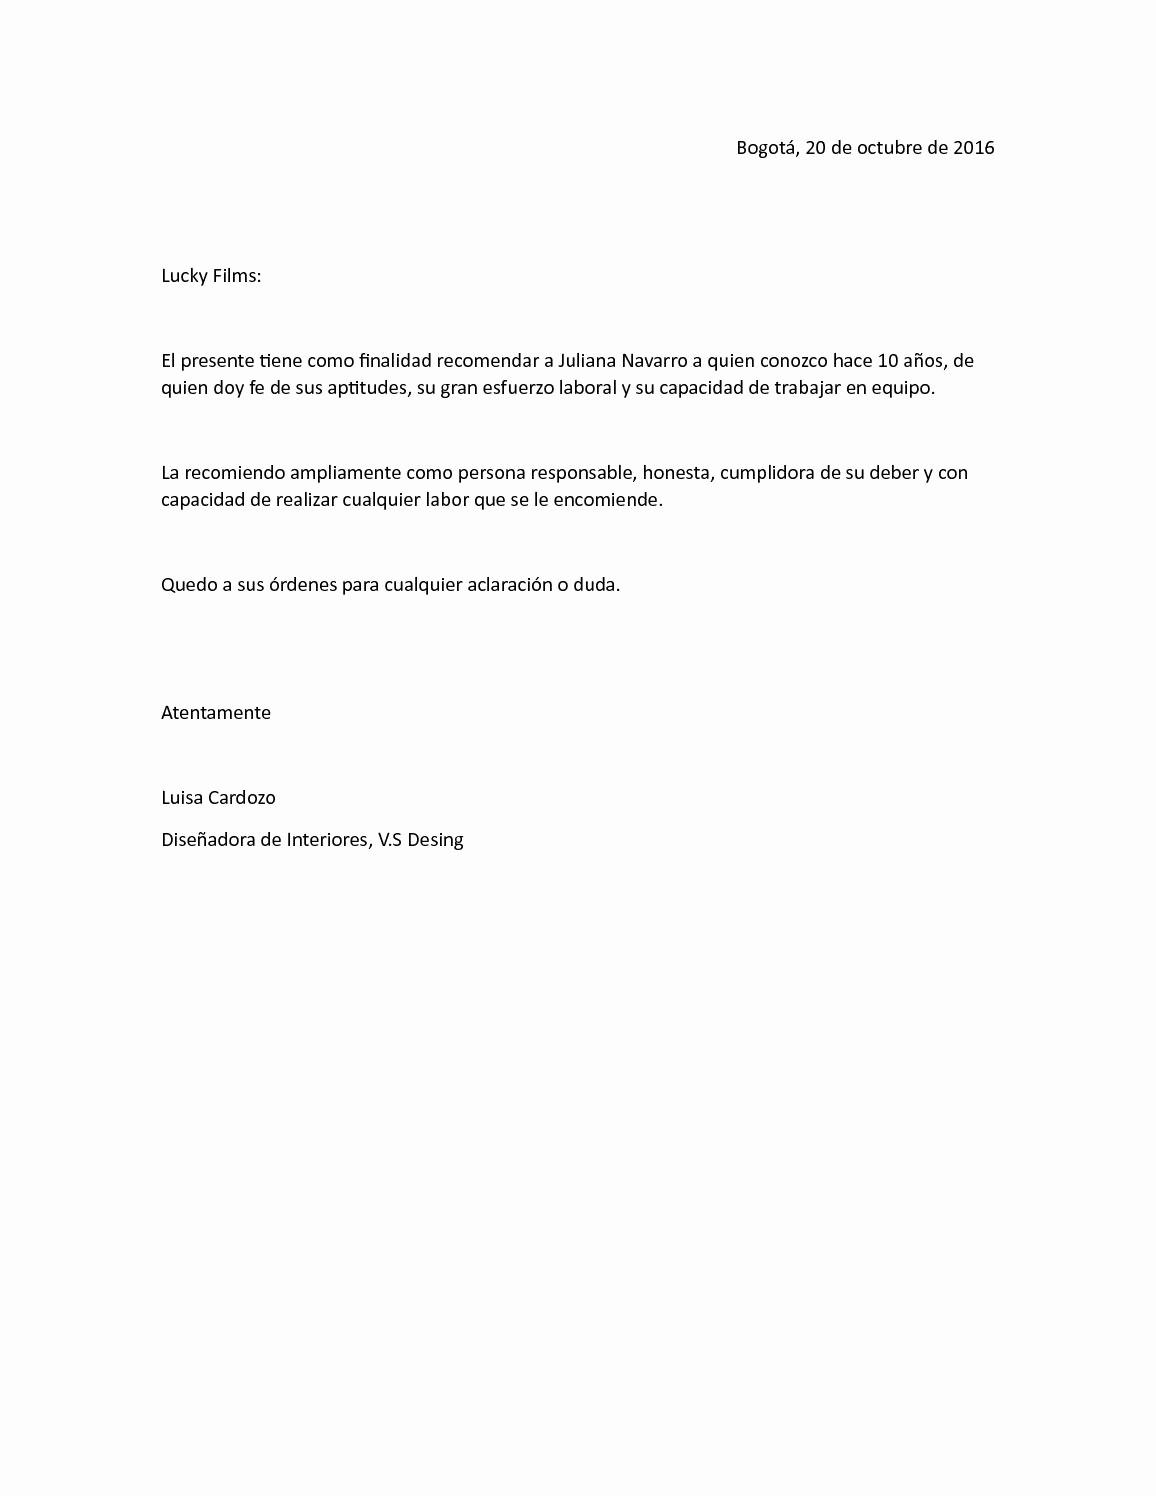 Ejemplo De Cartas De Recomendacion Awesome Calaméo Ejemplo Carta De Re Endacion Personal